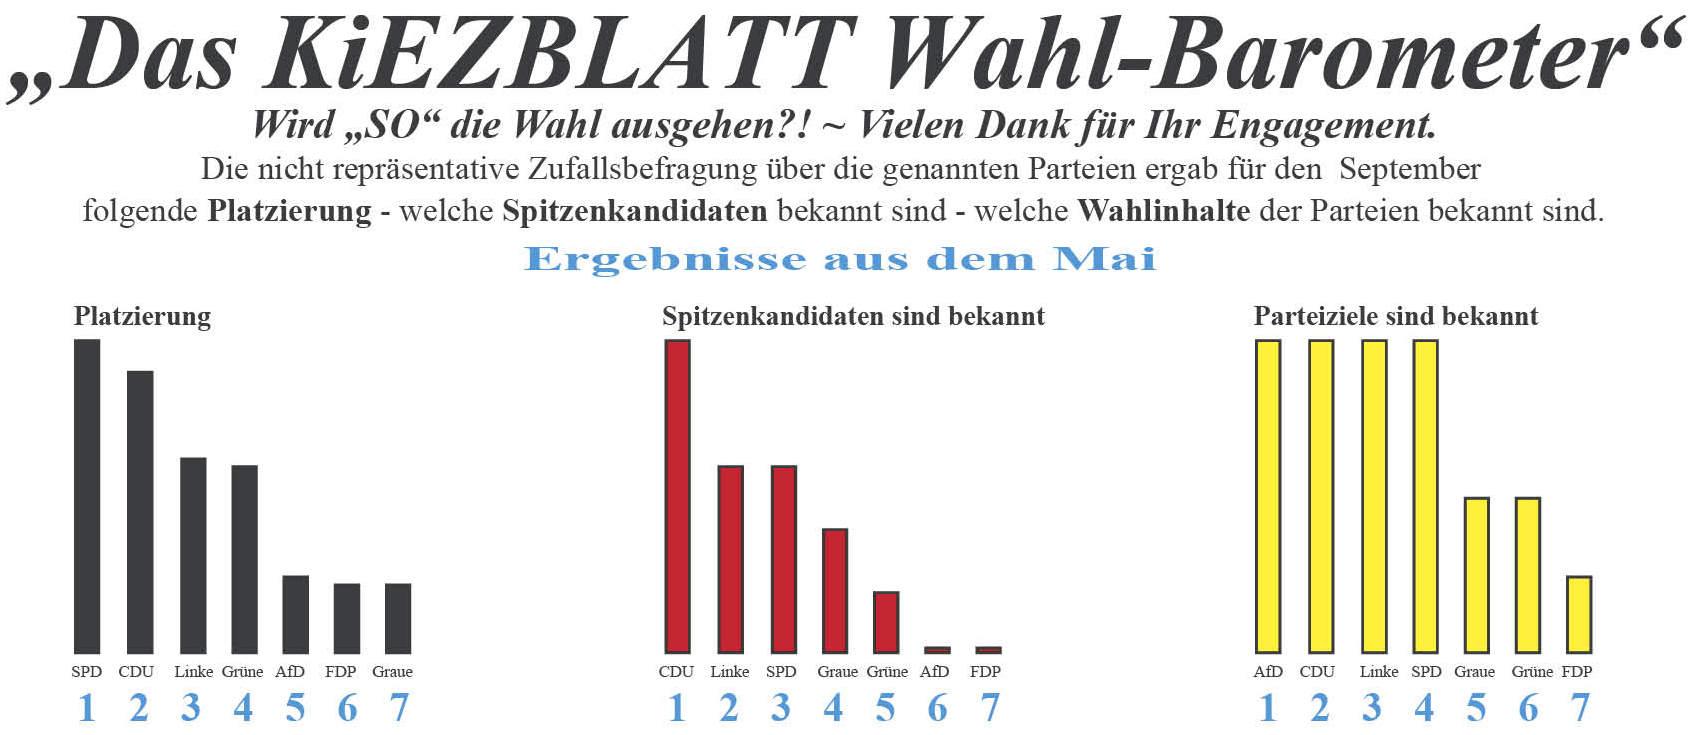 135 wp 14 Wahlbarometer Mai